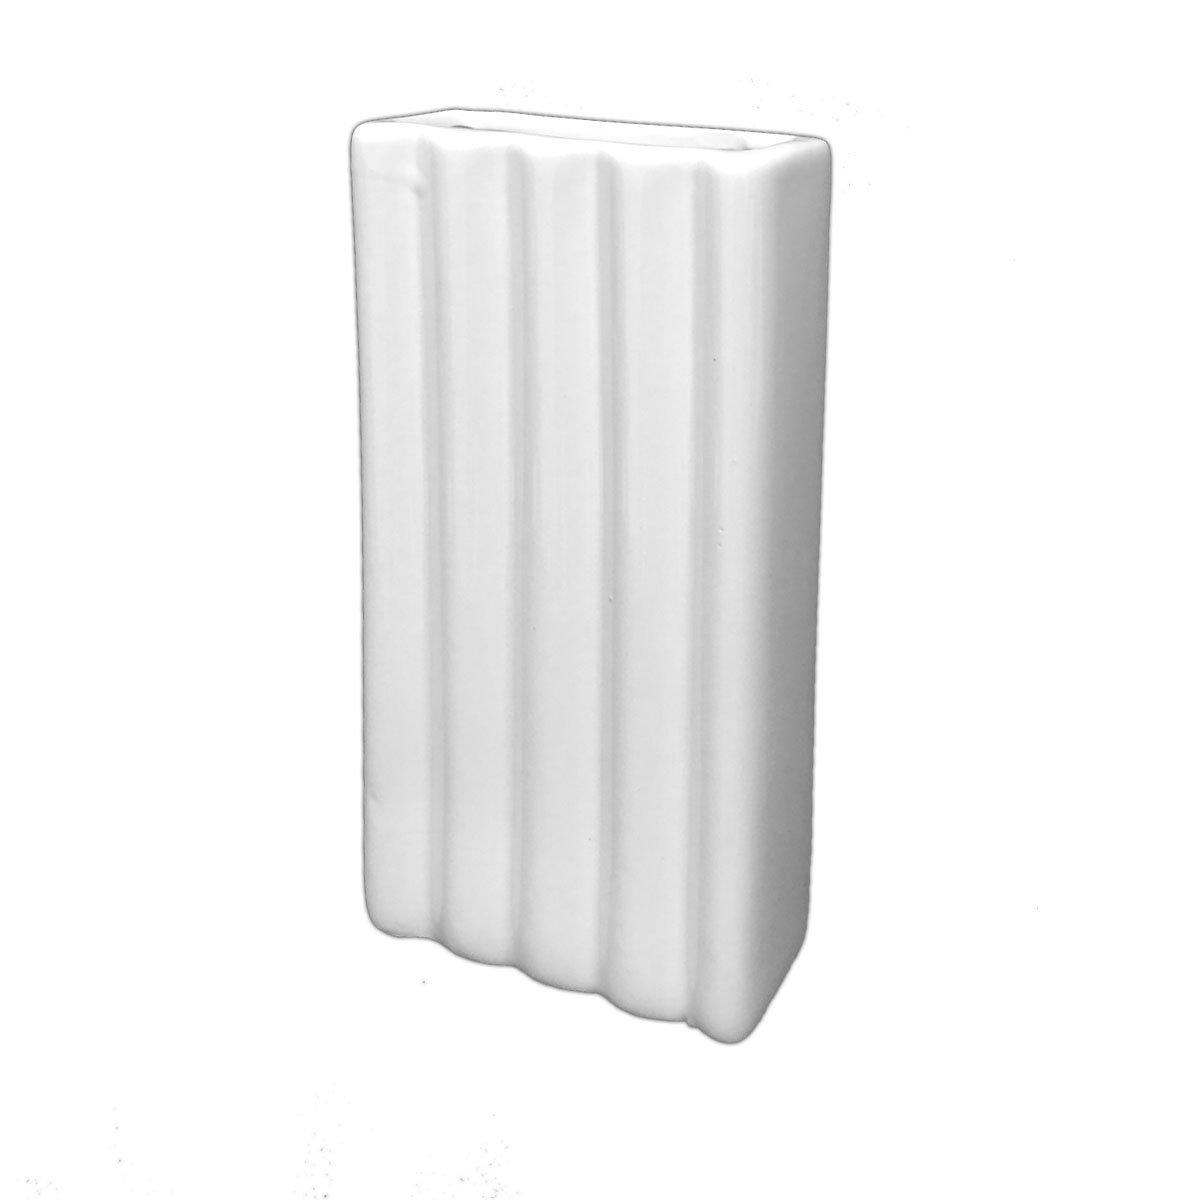 3x Keramik Wasserverdunster Fur Heizkorper Raumbefeuchter